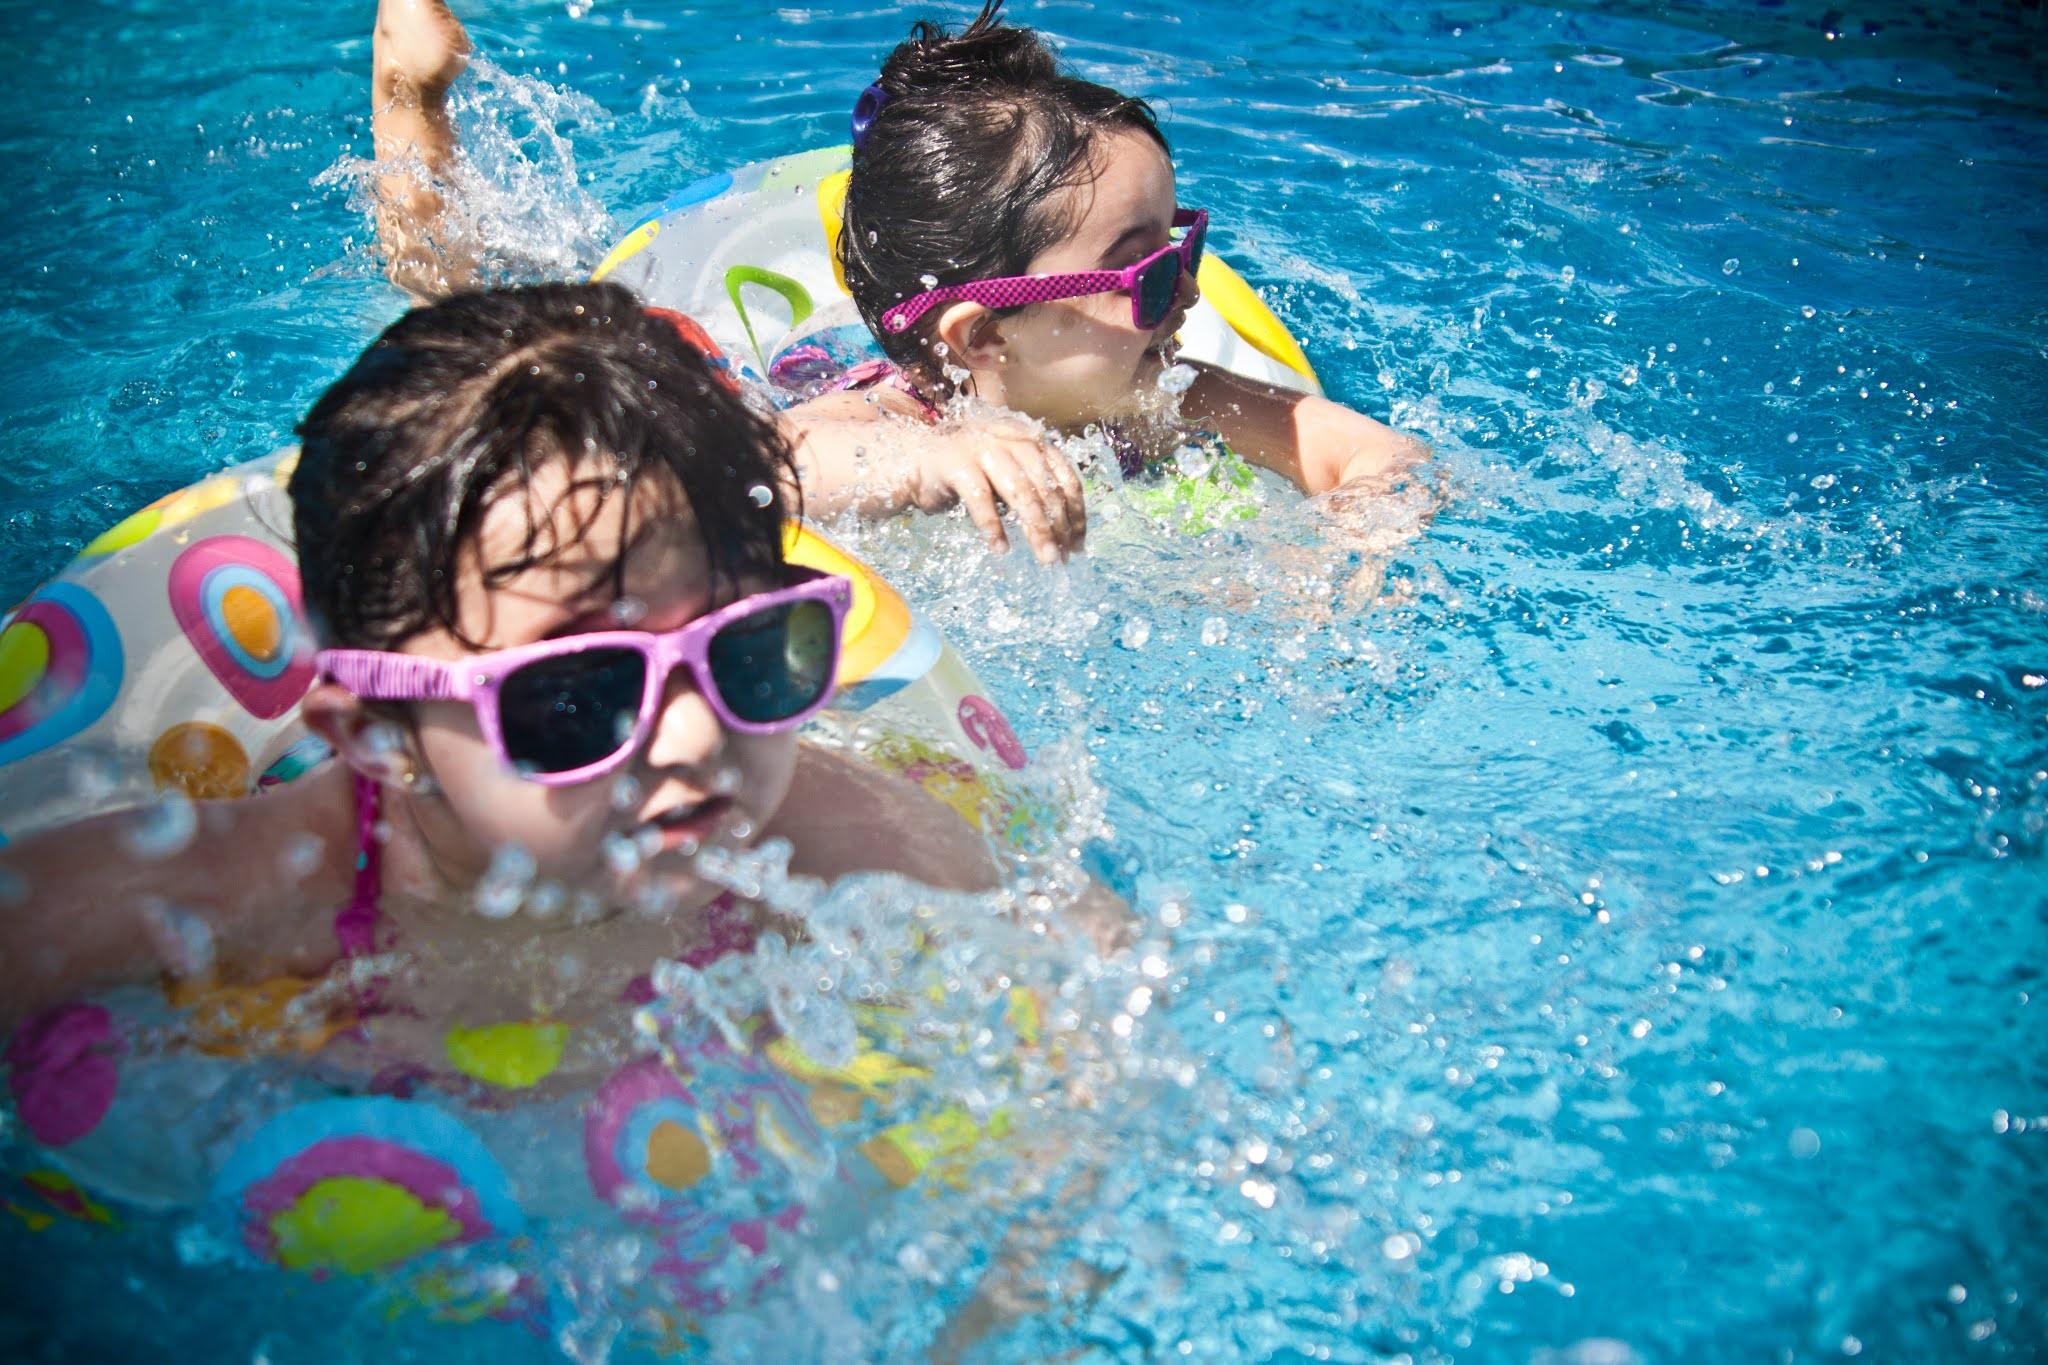 बच्चों को तैरना कैसे सिखाएं और ये क्यूँ आवश्यक है ? How to teach your child to swim & its benefits - Tiny Tycoons